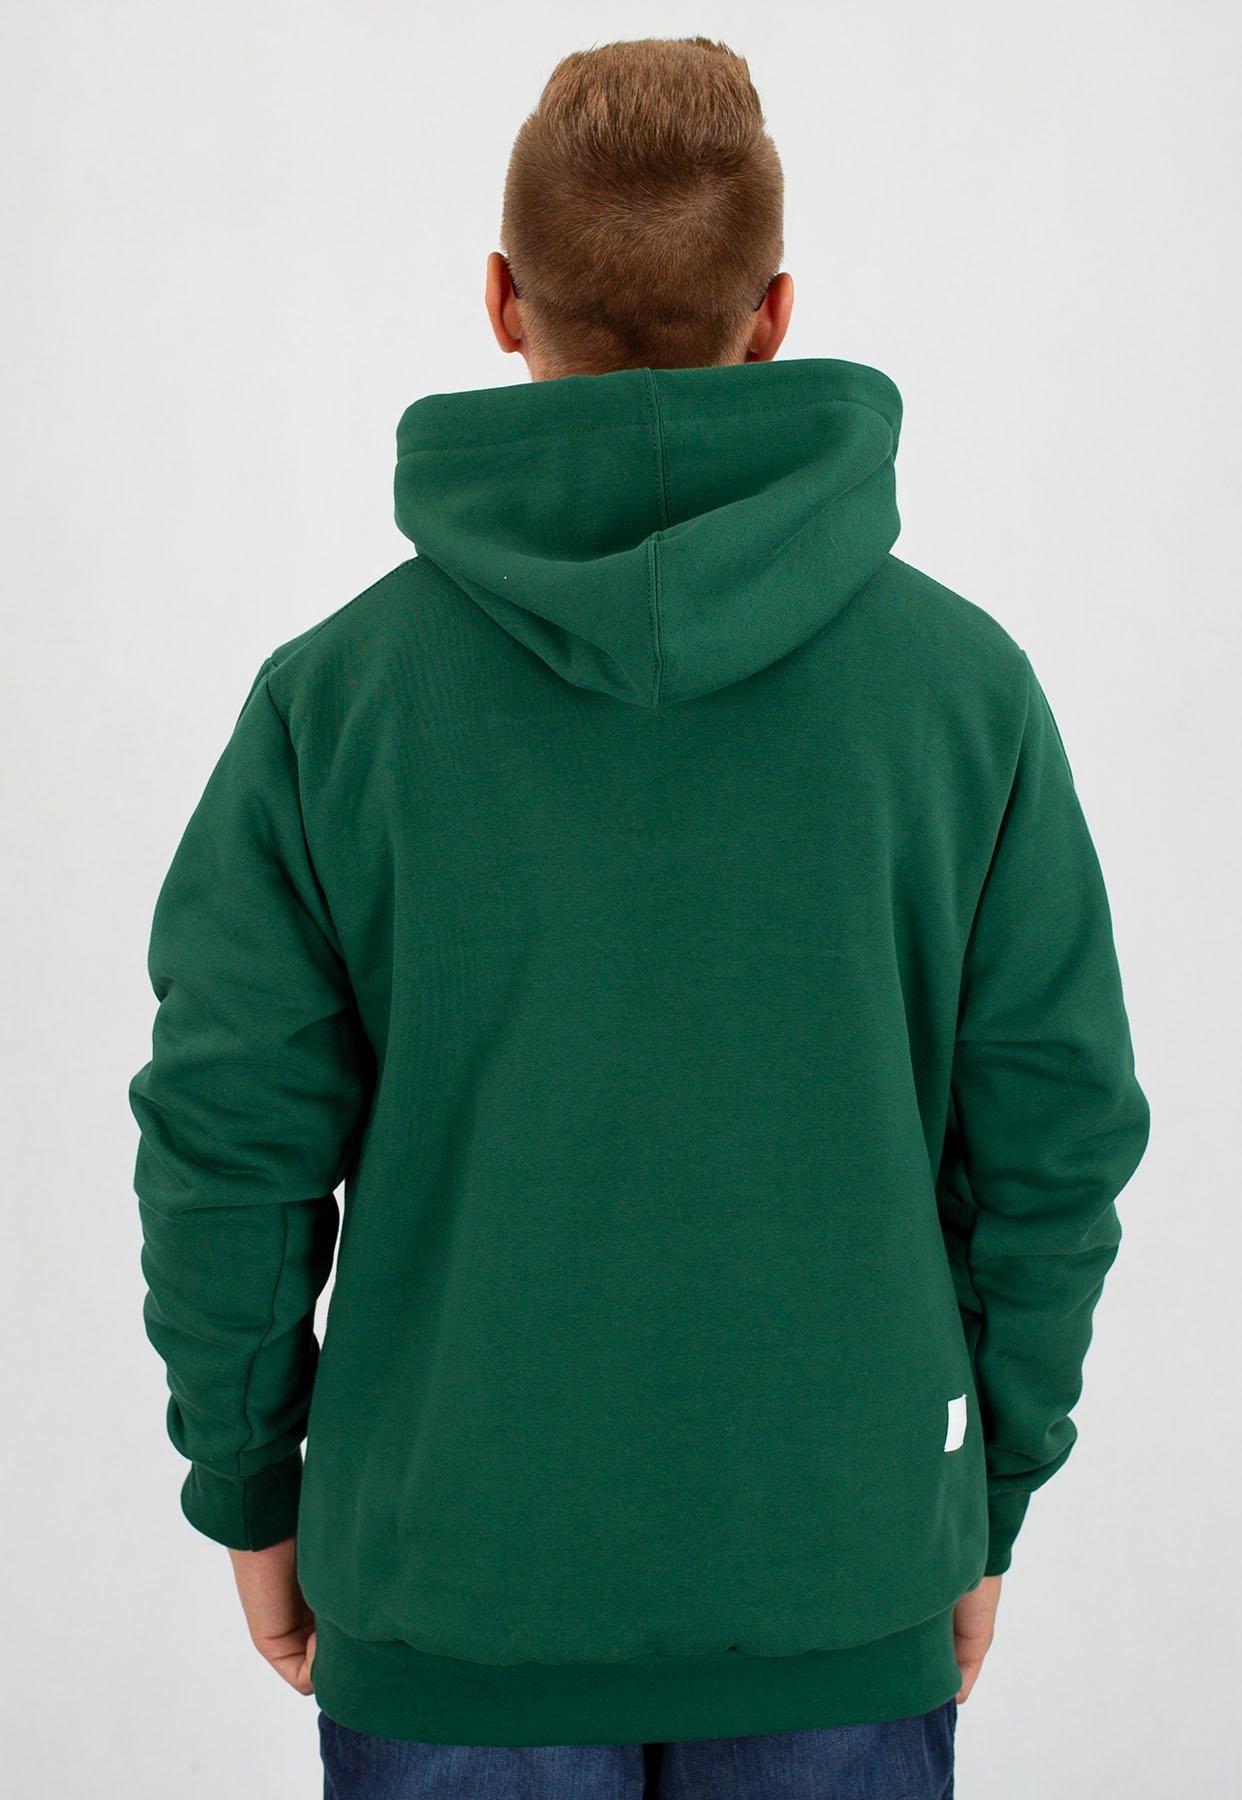 bluza ssg zielono czarna